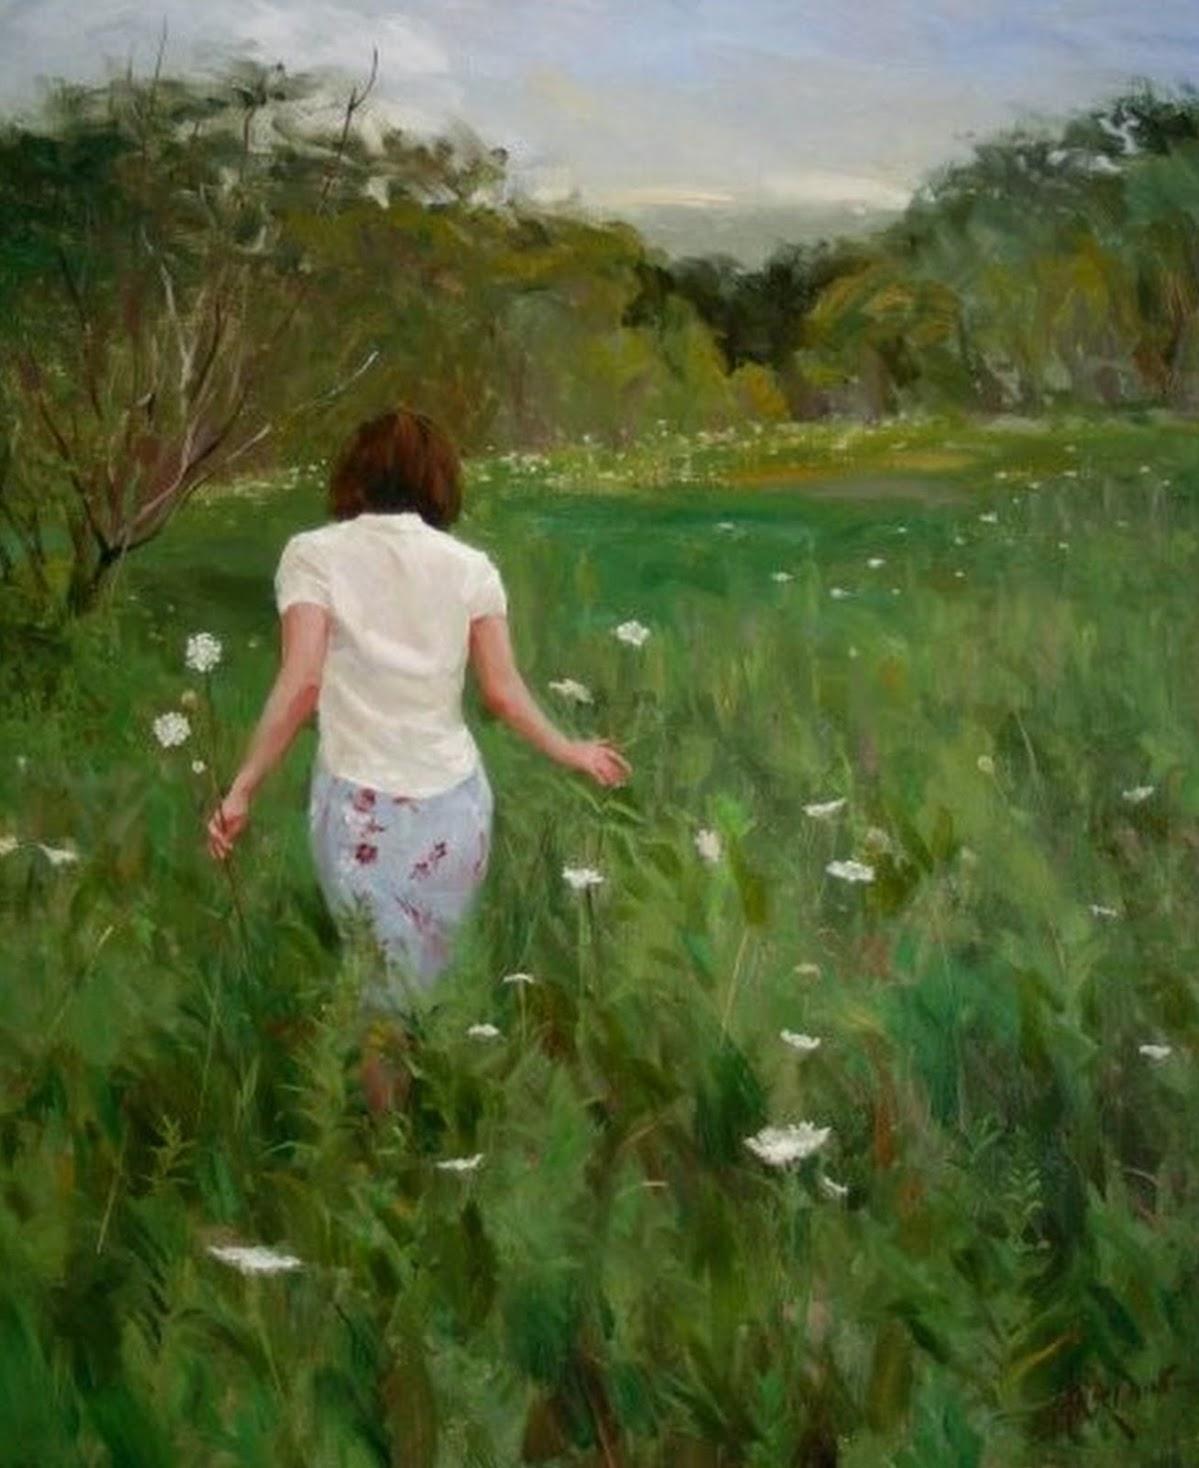 http://2.bp.blogspot.com/-CyXyJRVAsnY/UjHl5dGqUaI/AAAAAAABUns/LoNAqV5Sn0c/s1468/impresionismo-mujer-pintura-moderna.jpg